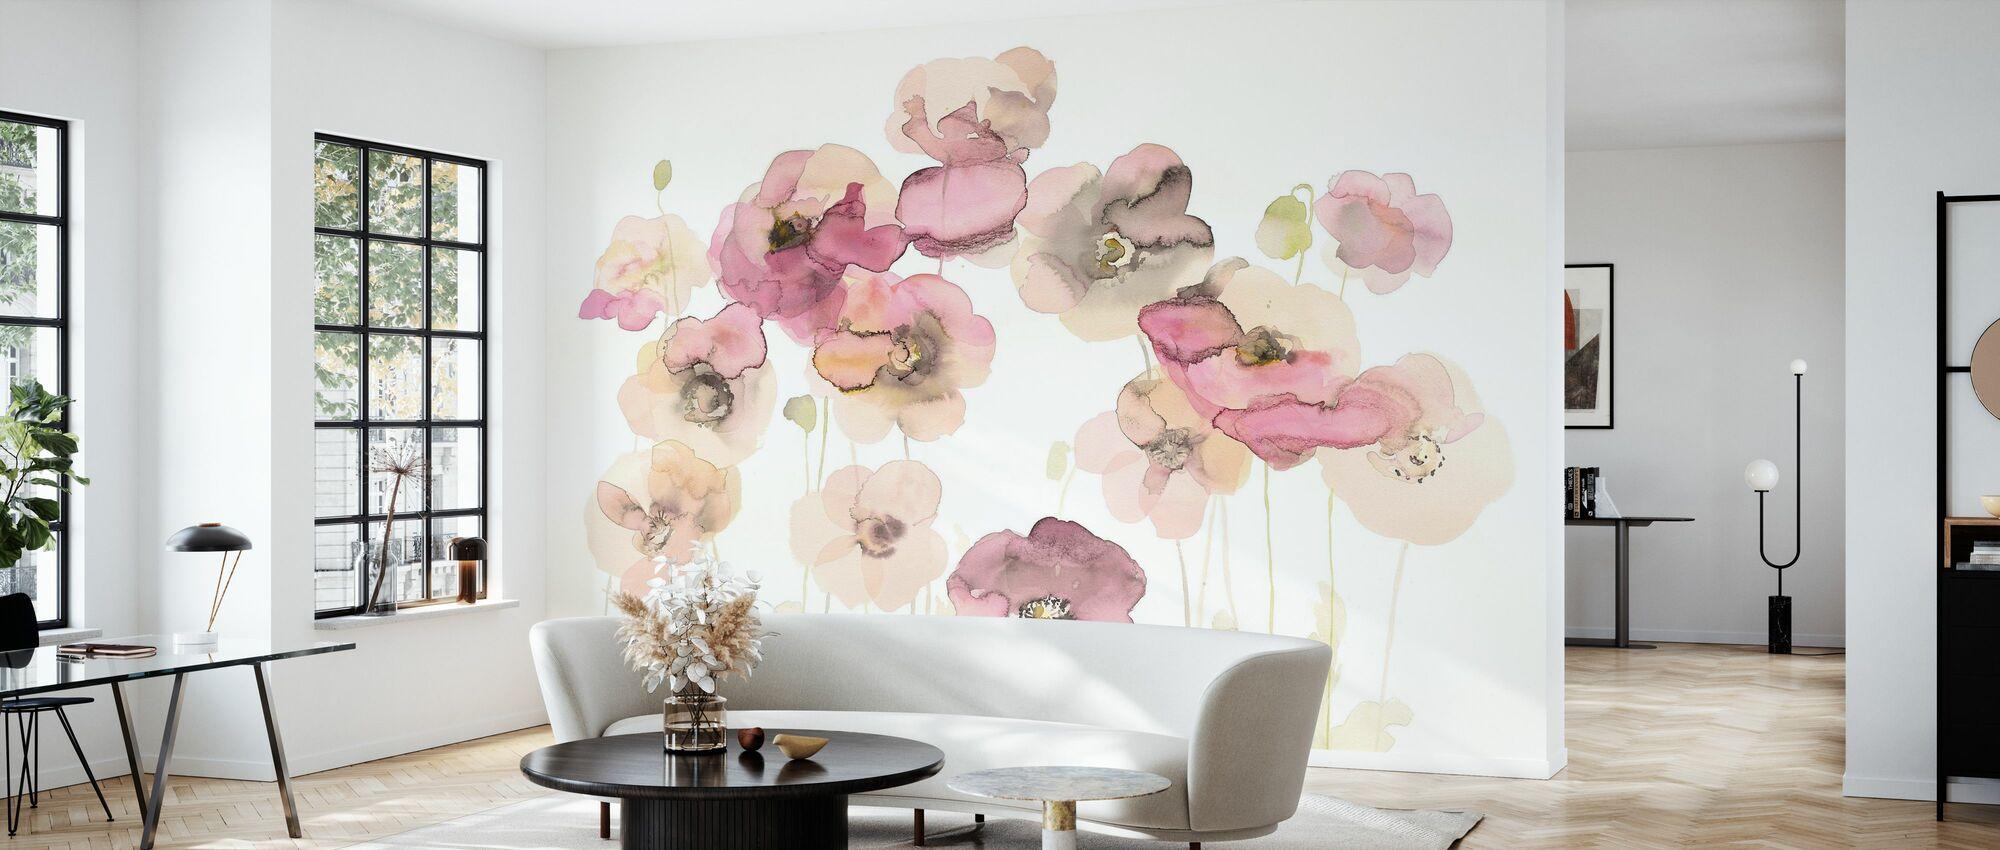 Delicate Poppies - Wallpaper - Living Room